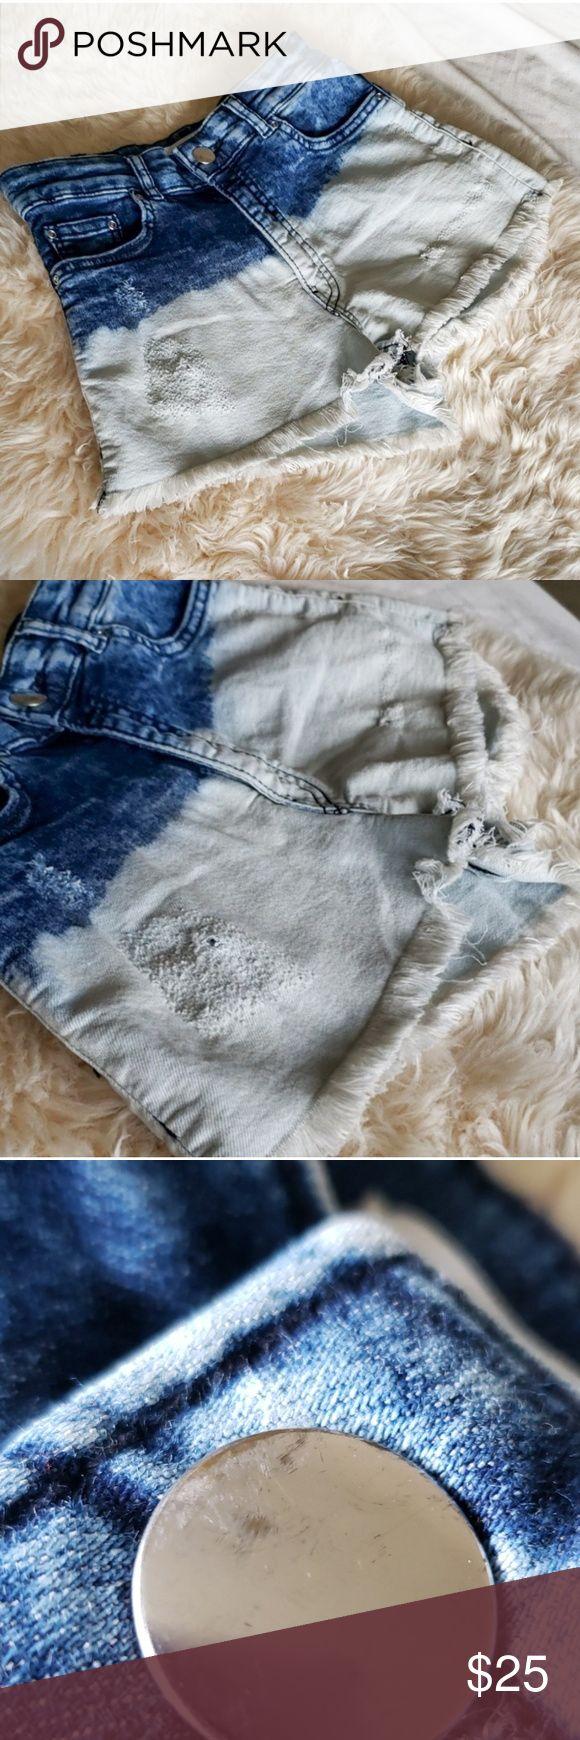 Distressed H & M 2 Tone Coachella Shorts Super süße zweifarbige, tauchgefärbte Ombre …   – My Posh Picks